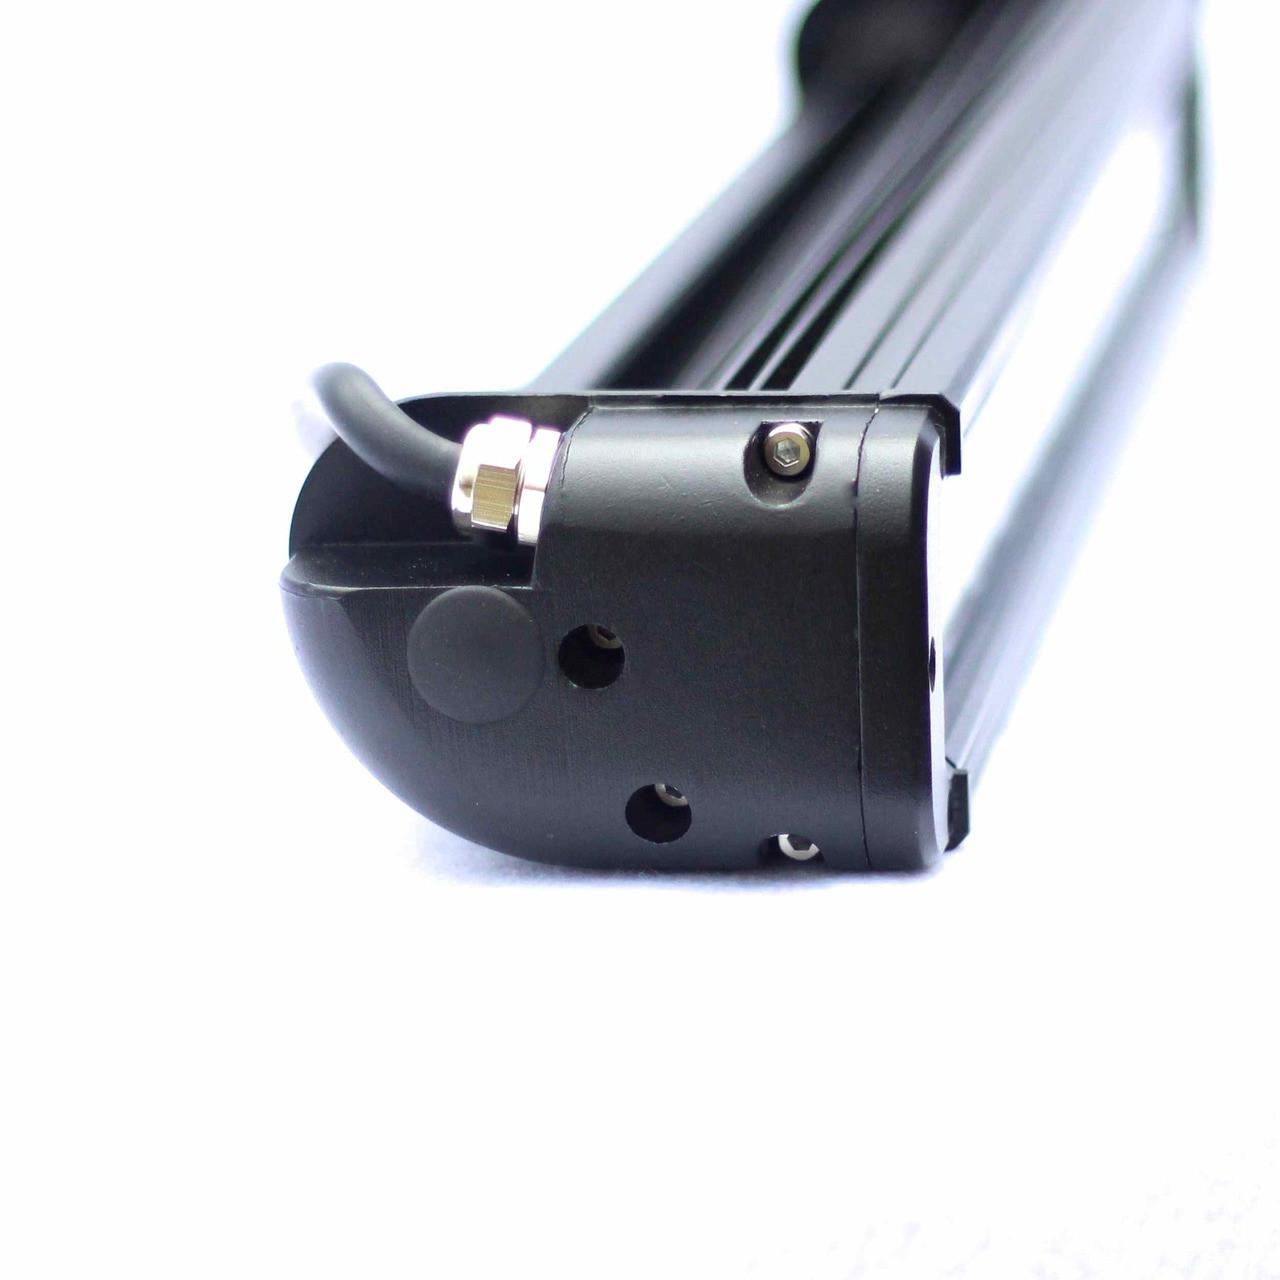 Waterproof led light bar with 10 watt cree led single row with HD housing.